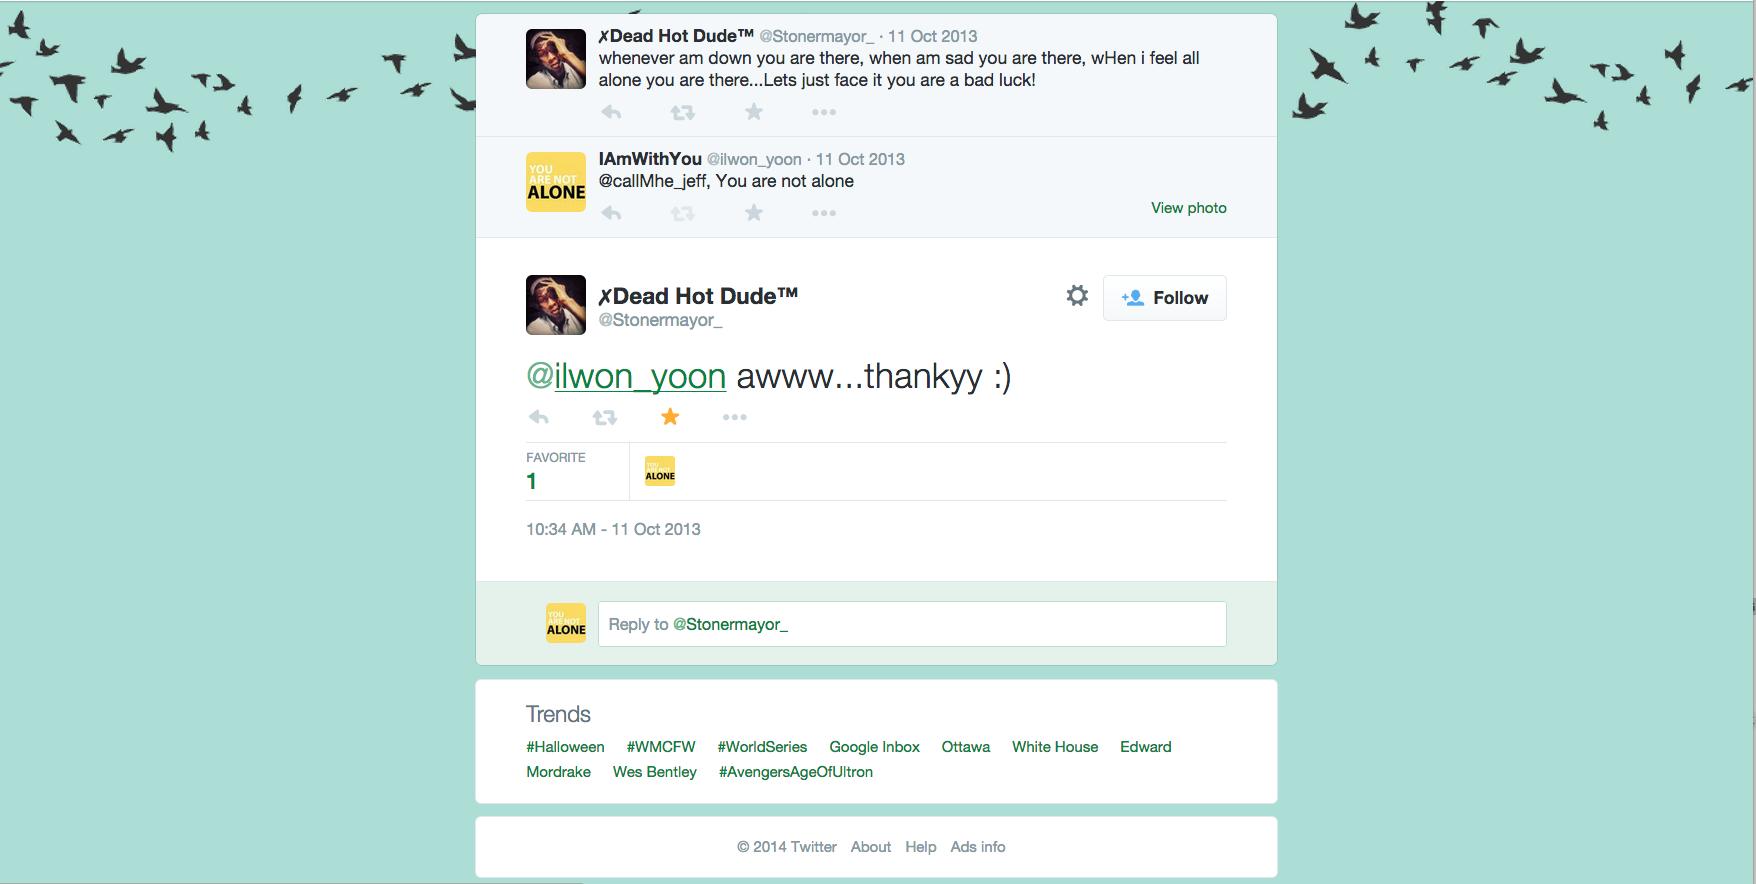 Screenshot 2014-10-22 23.25.10.png